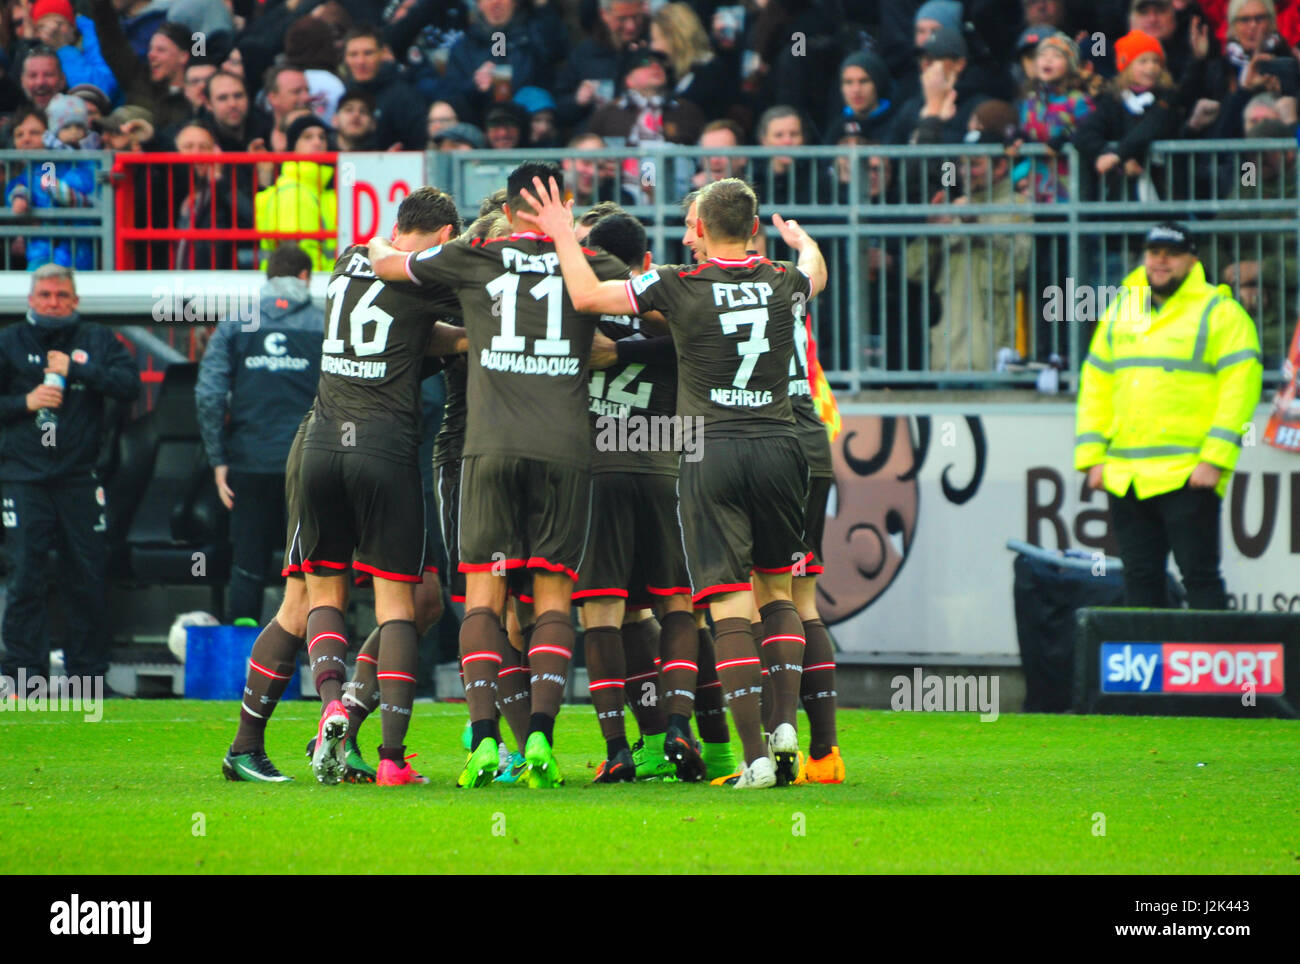 Hamburg, Germany. 28th April, 2017. FC St. Pauli vs. 1. FC Heidenheim (3:0), Hamburg, Germany: Celebration of first - Stock-Bilder